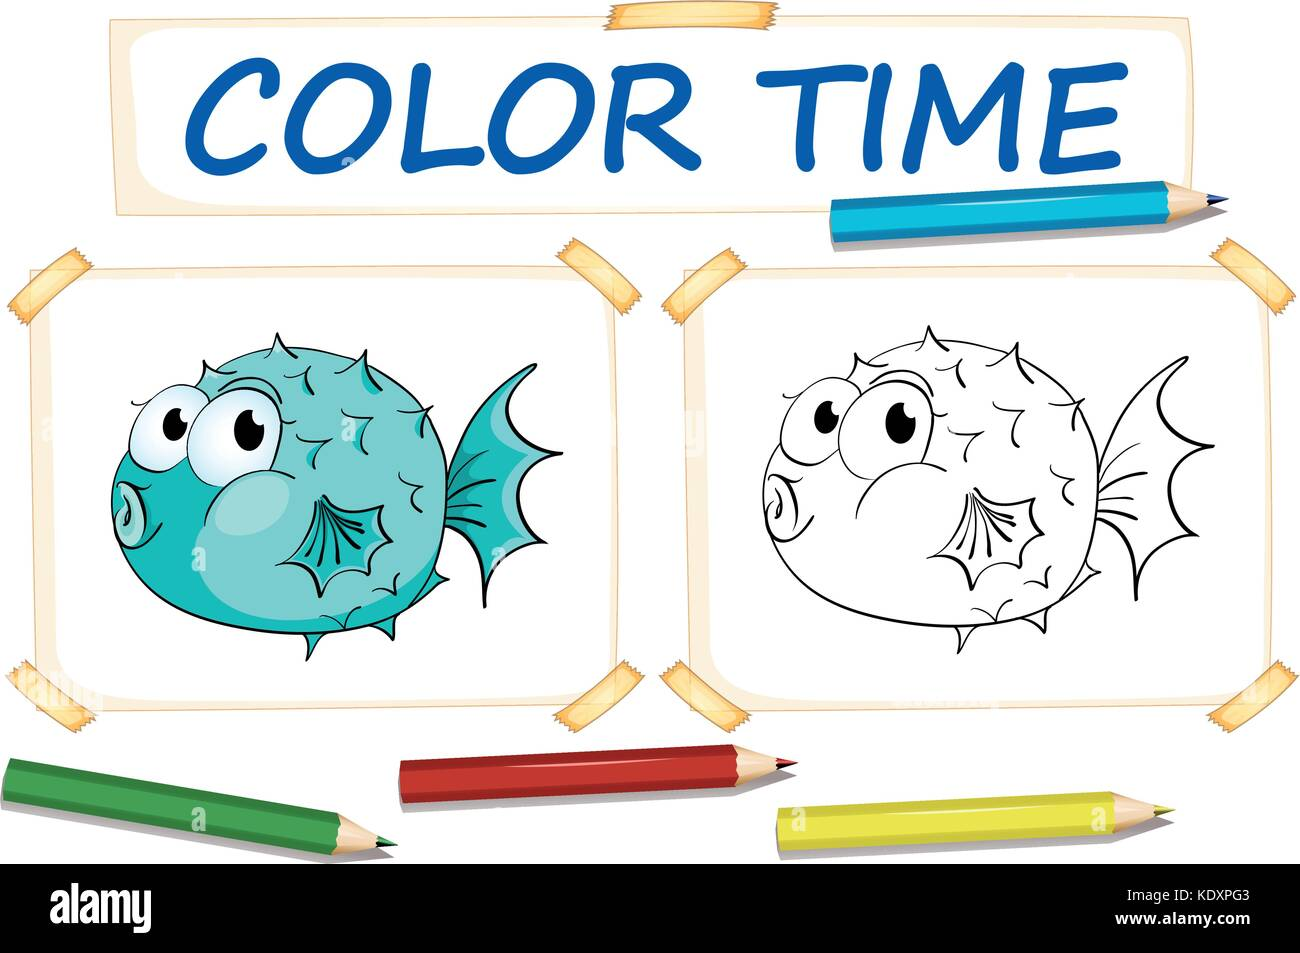 Puffer Fish Drawing Illustration Imágenes De Stock & Puffer Fish ...